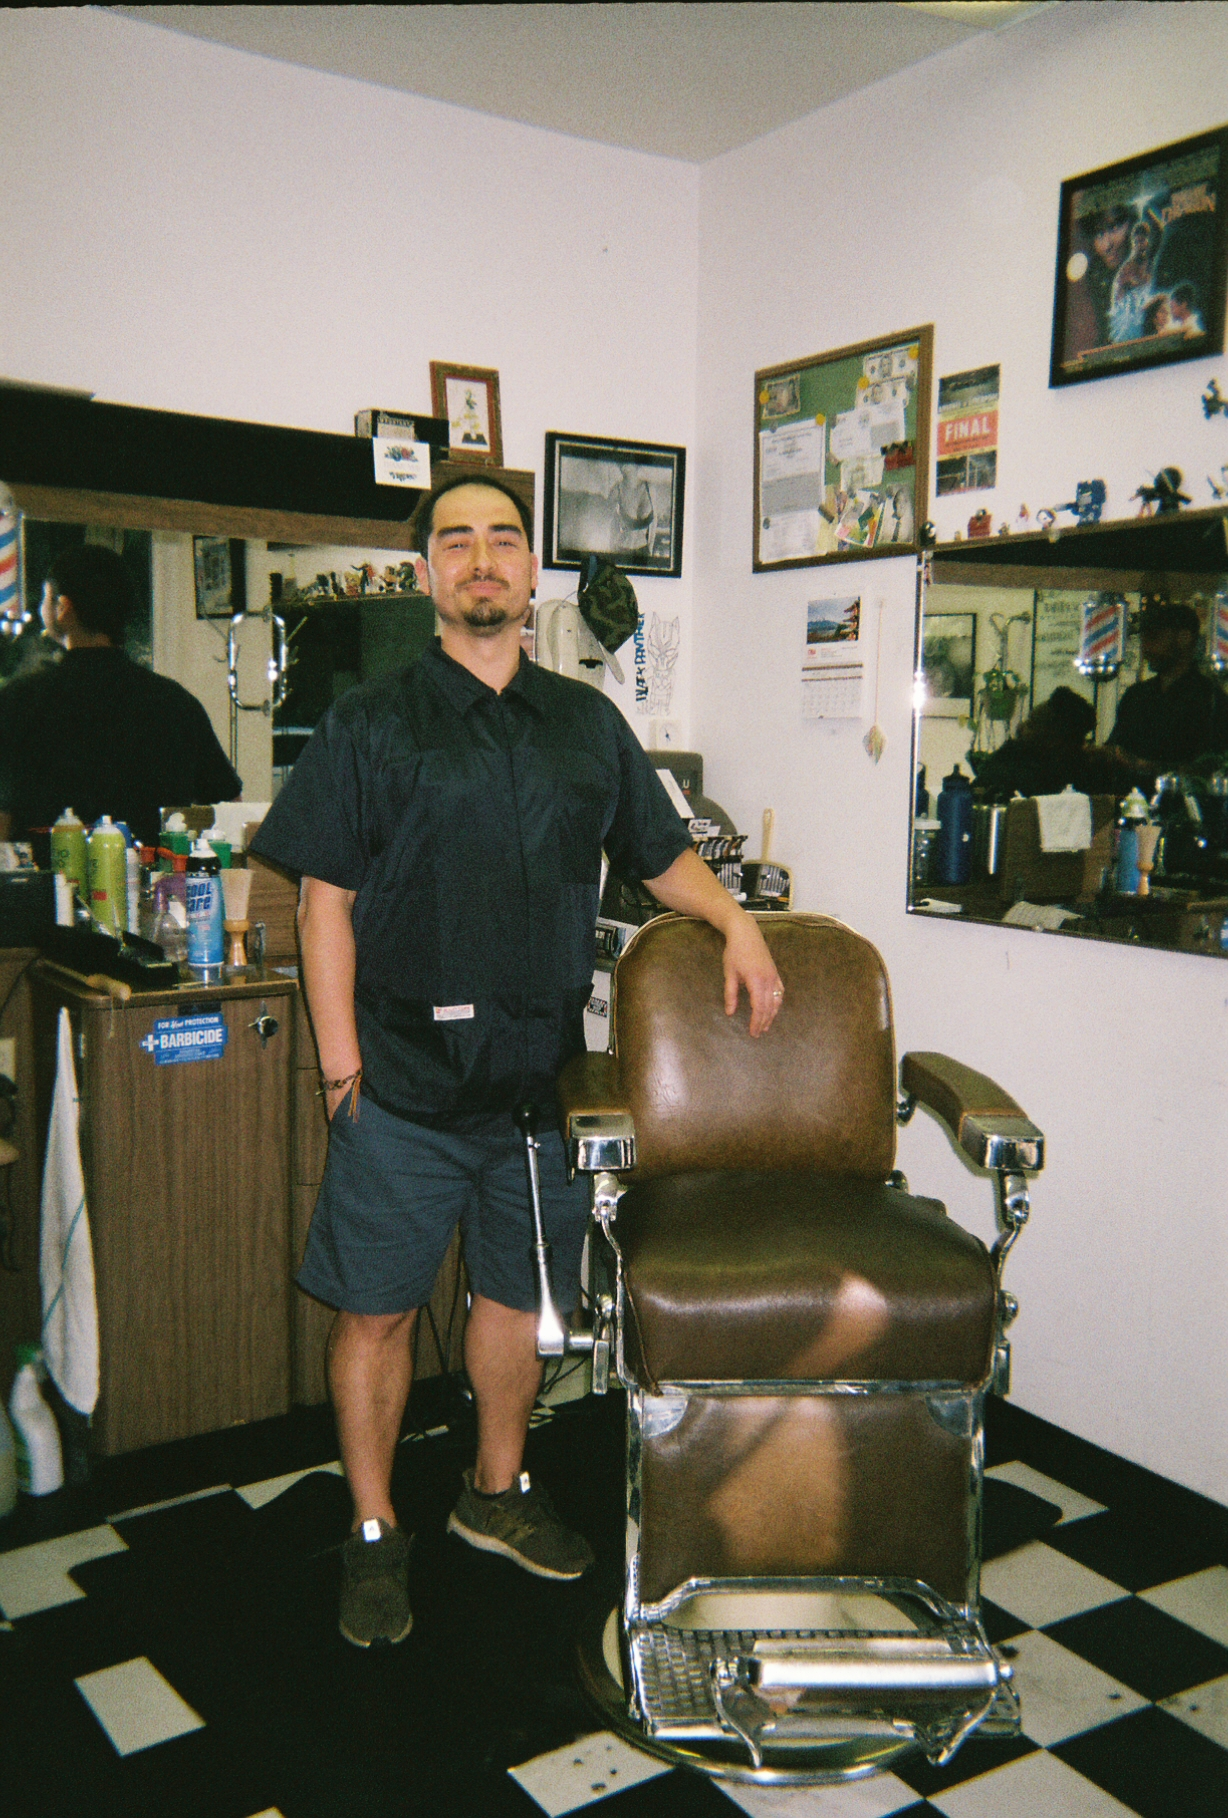 Nisei Barber Shop - Cory Umezu